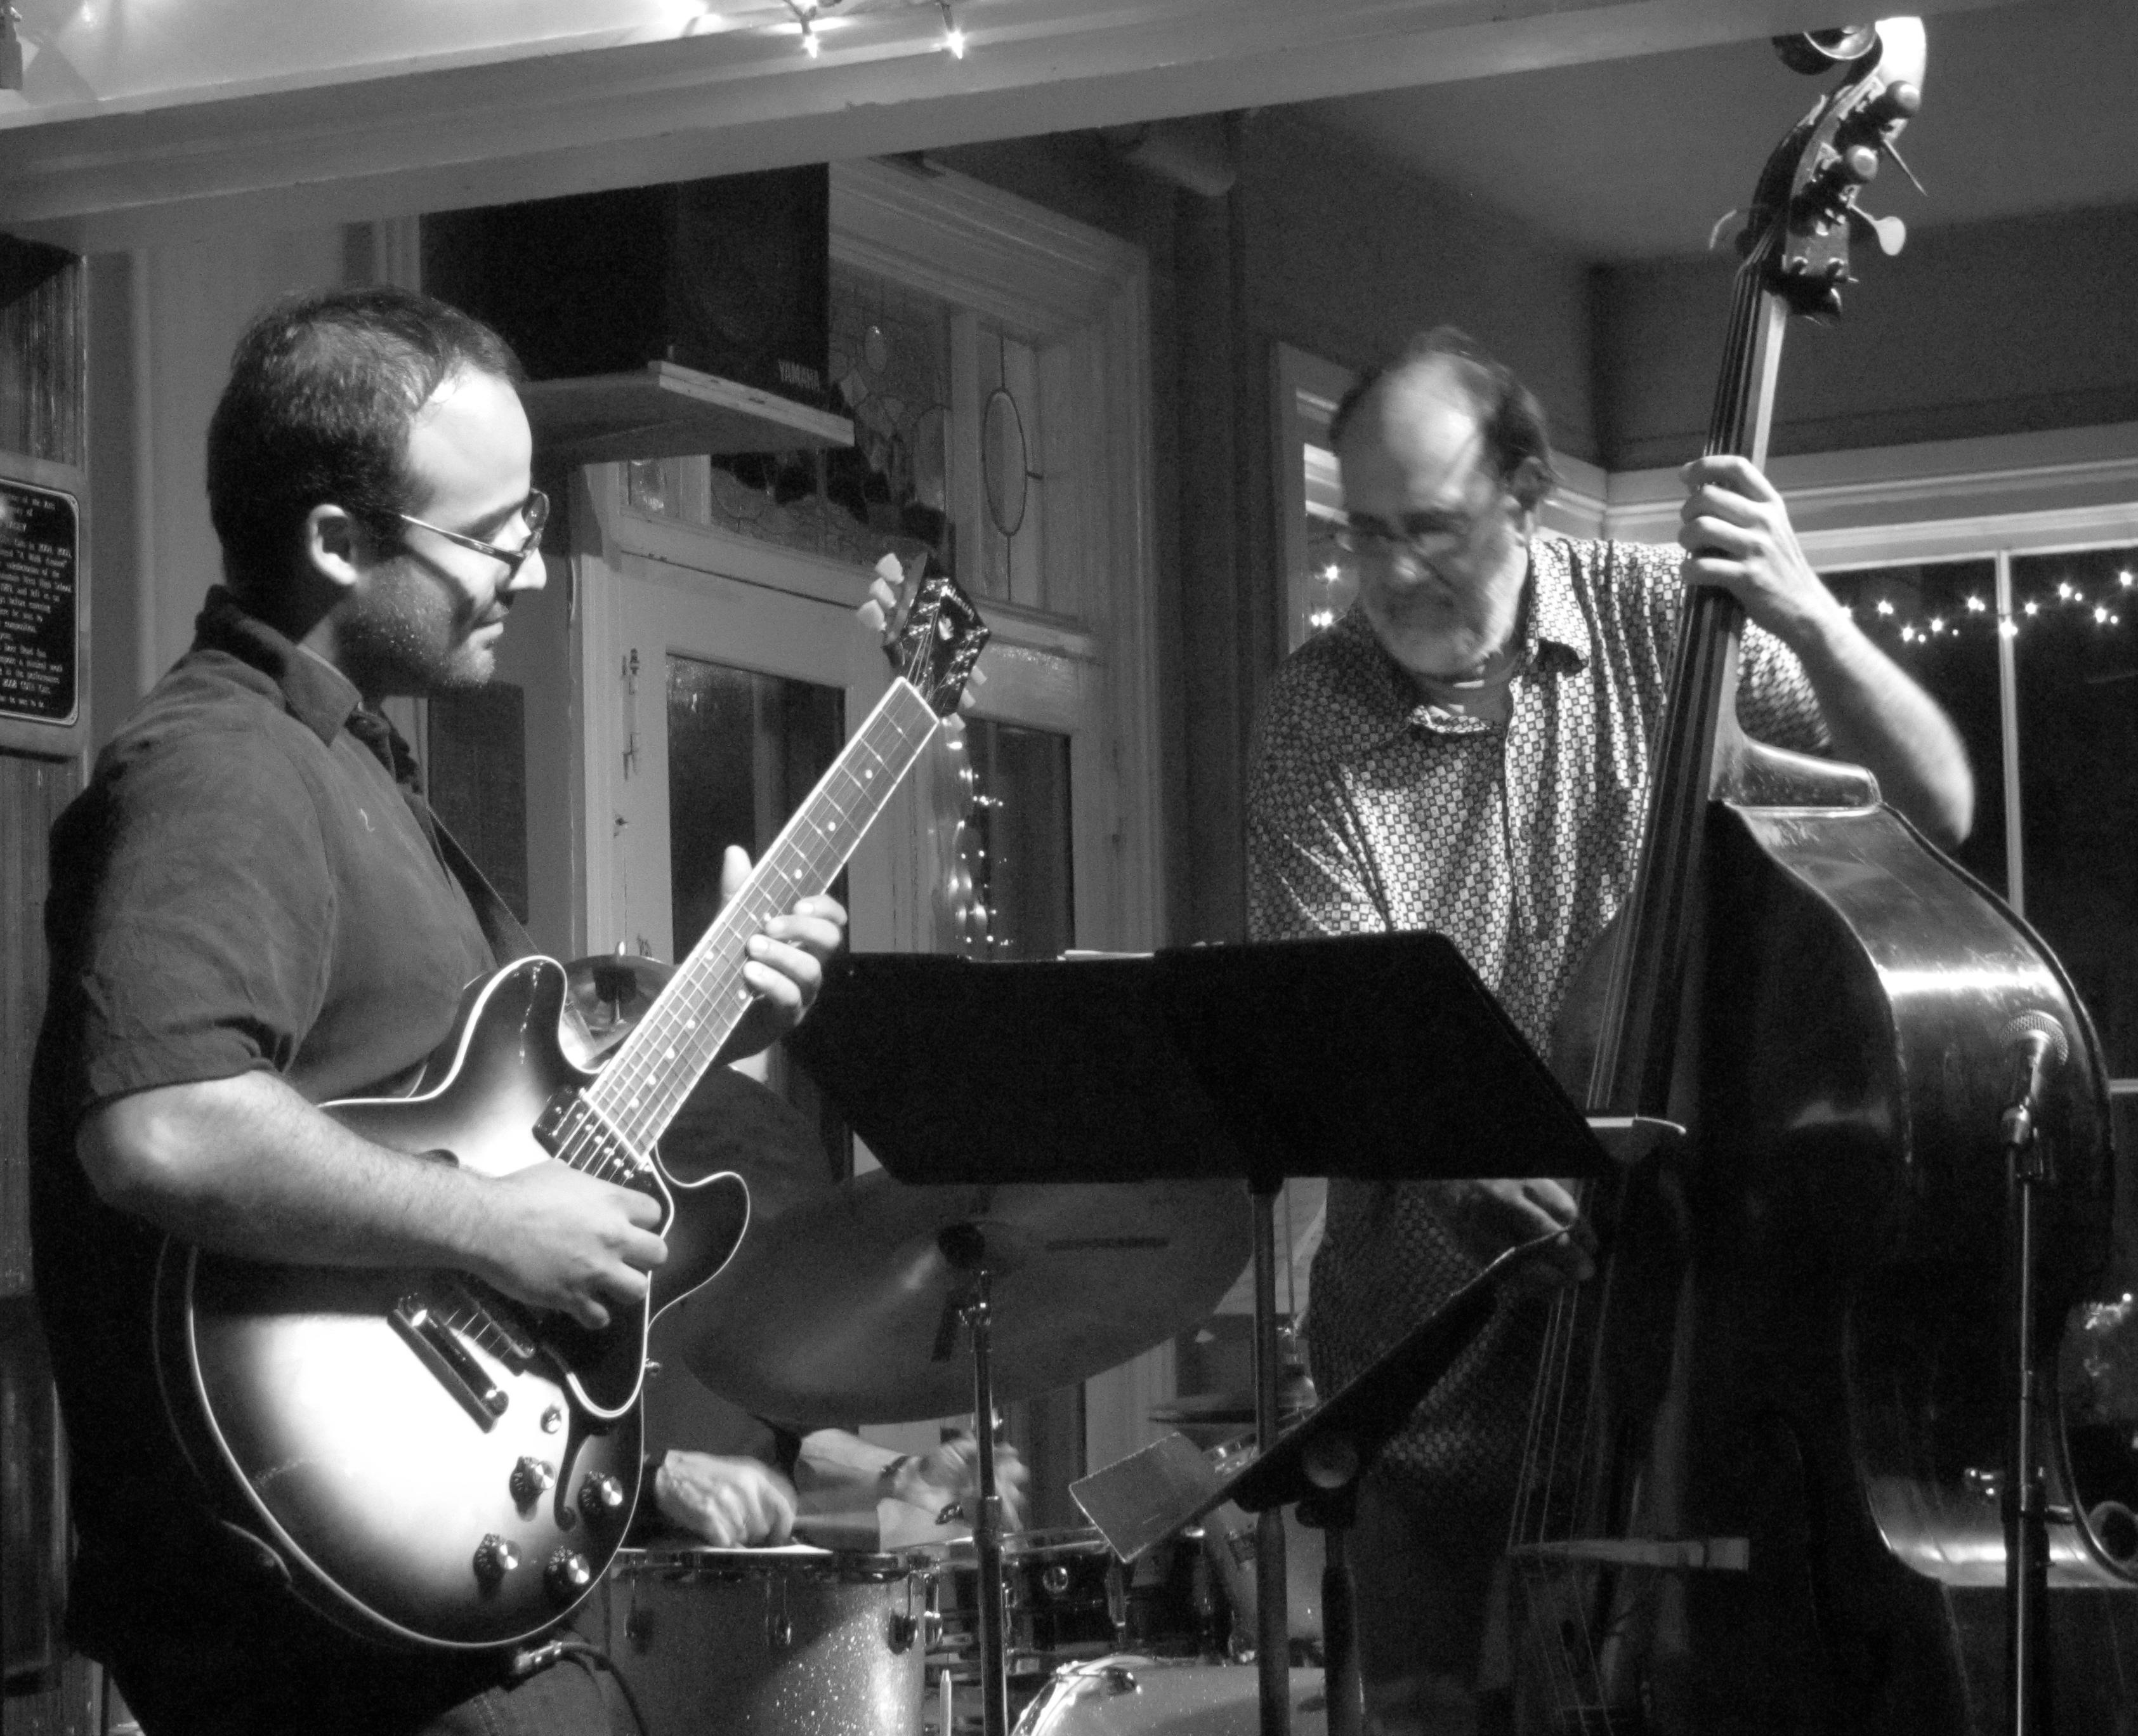 Playing at the Deer Head Inn Jazz Club, Tony Marino on Bass